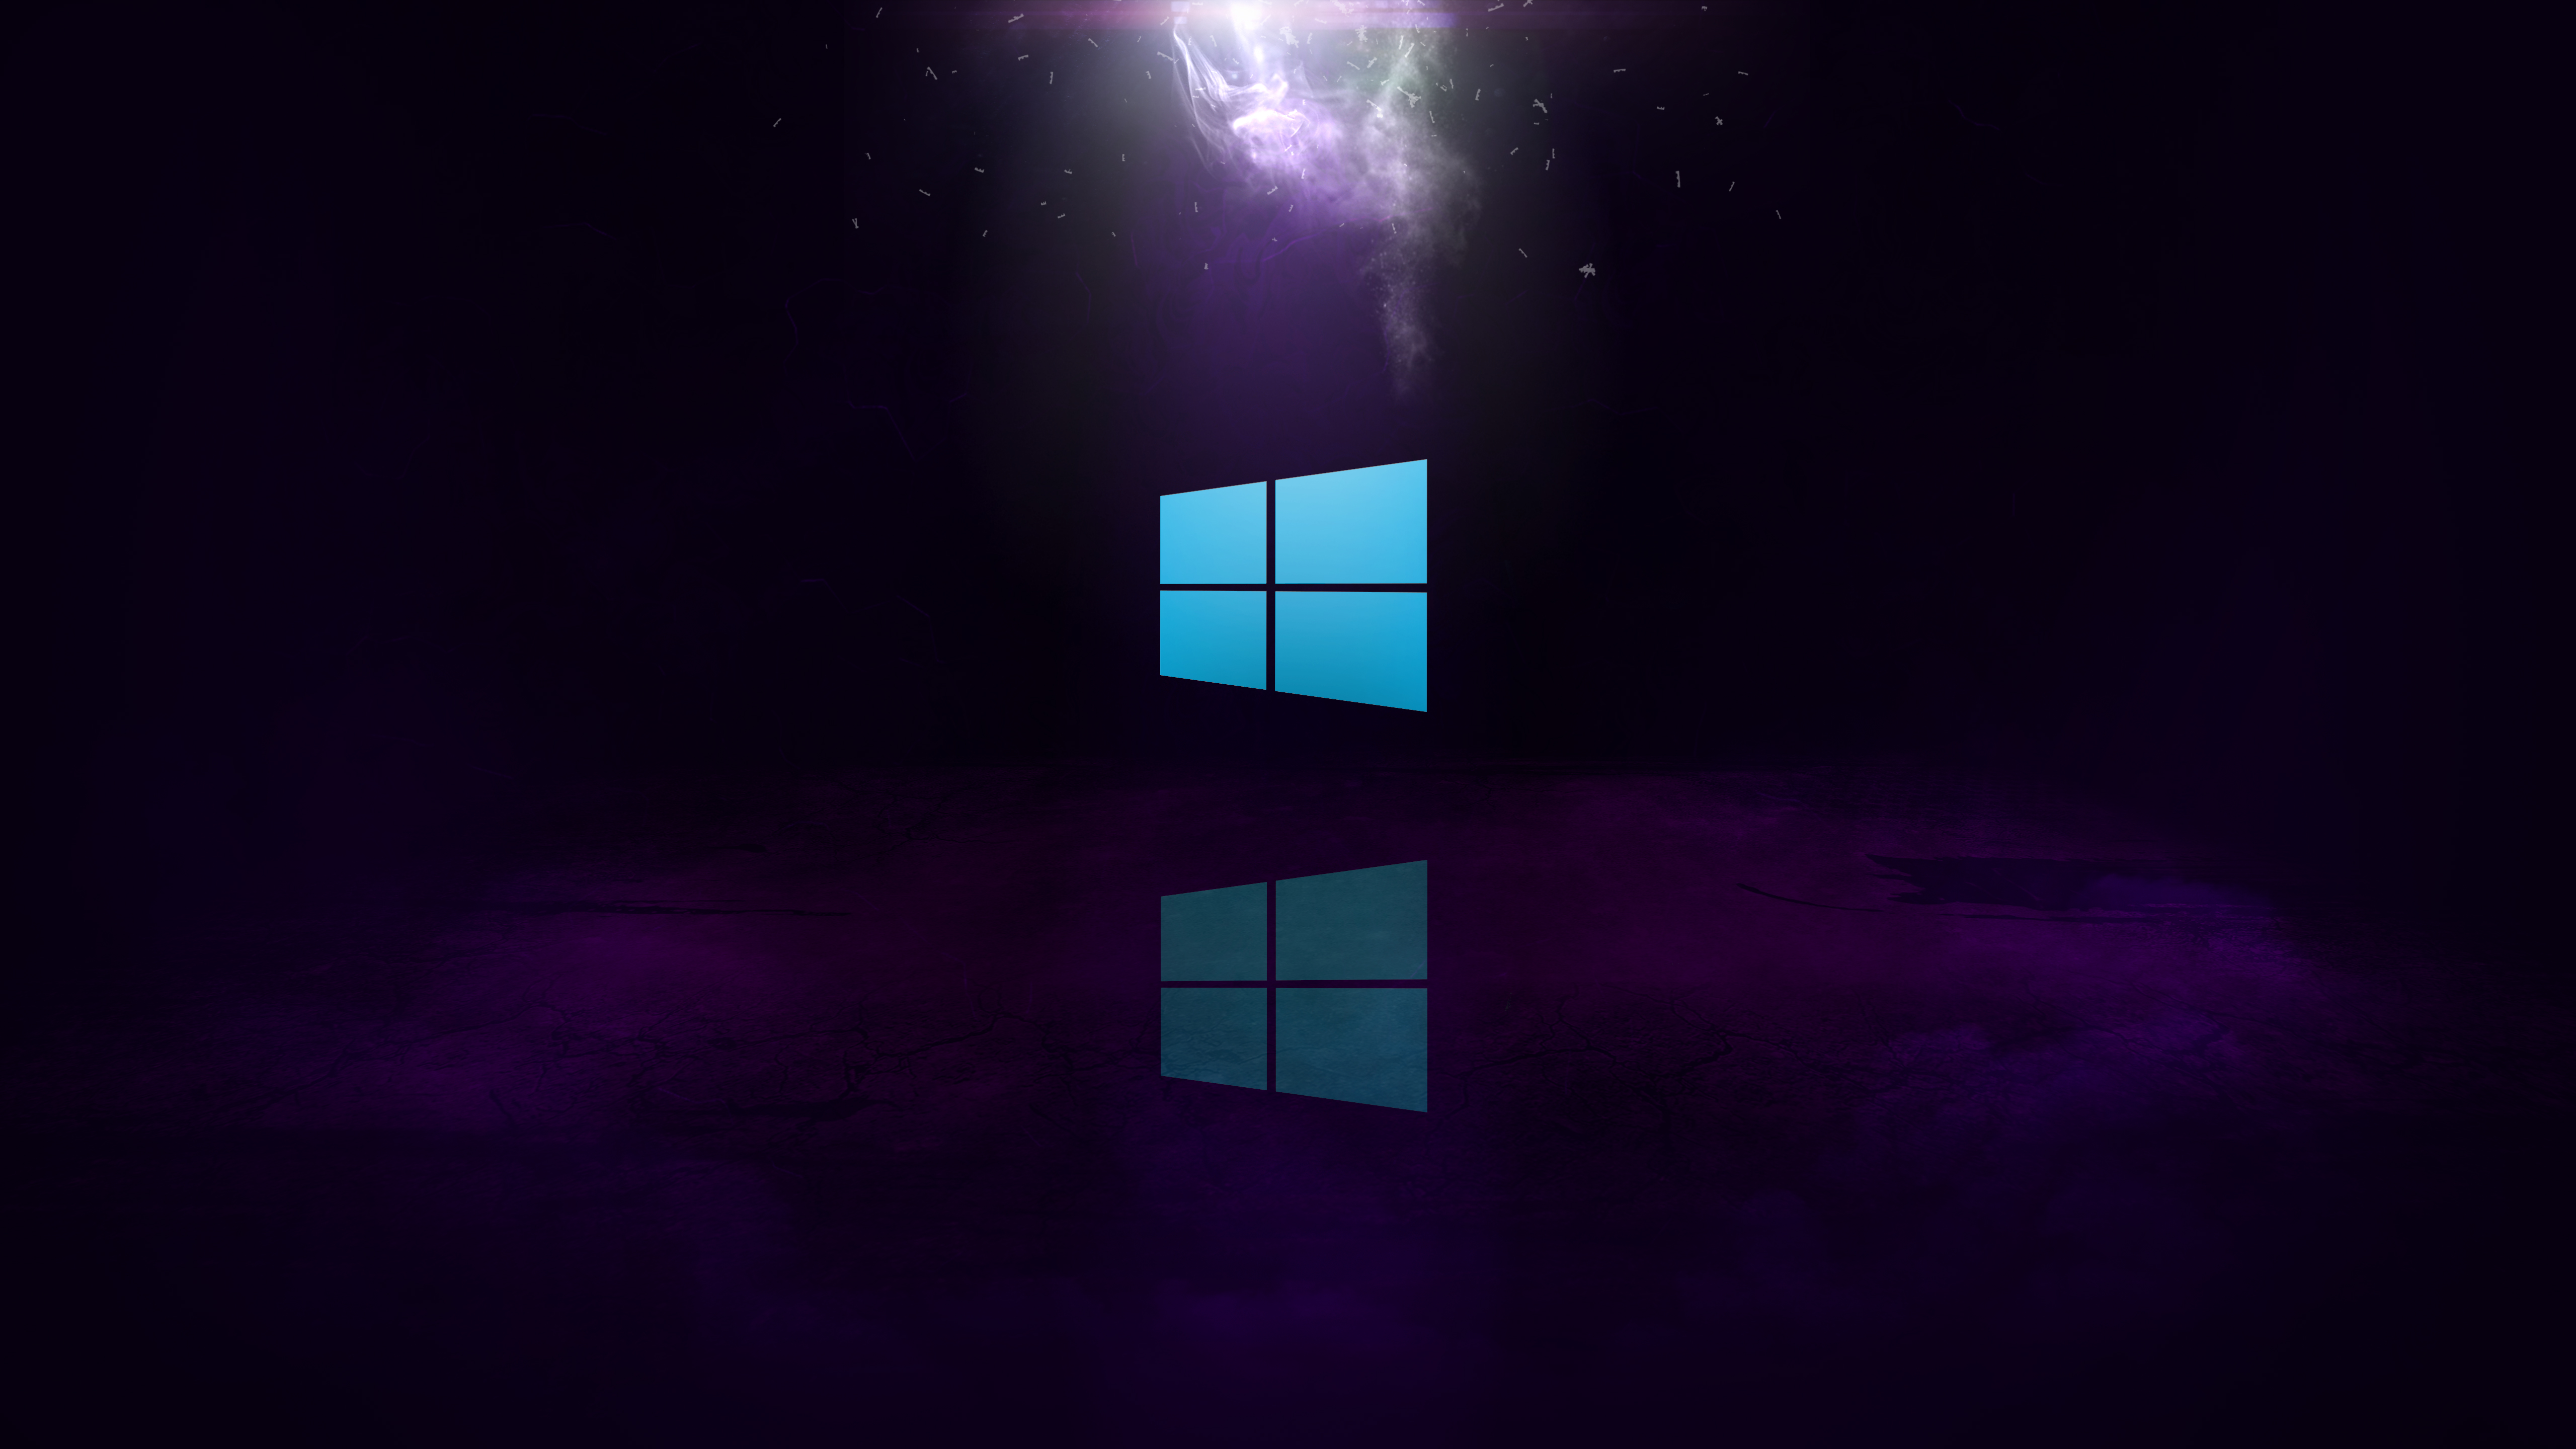 Desktop wallpaper for win 10